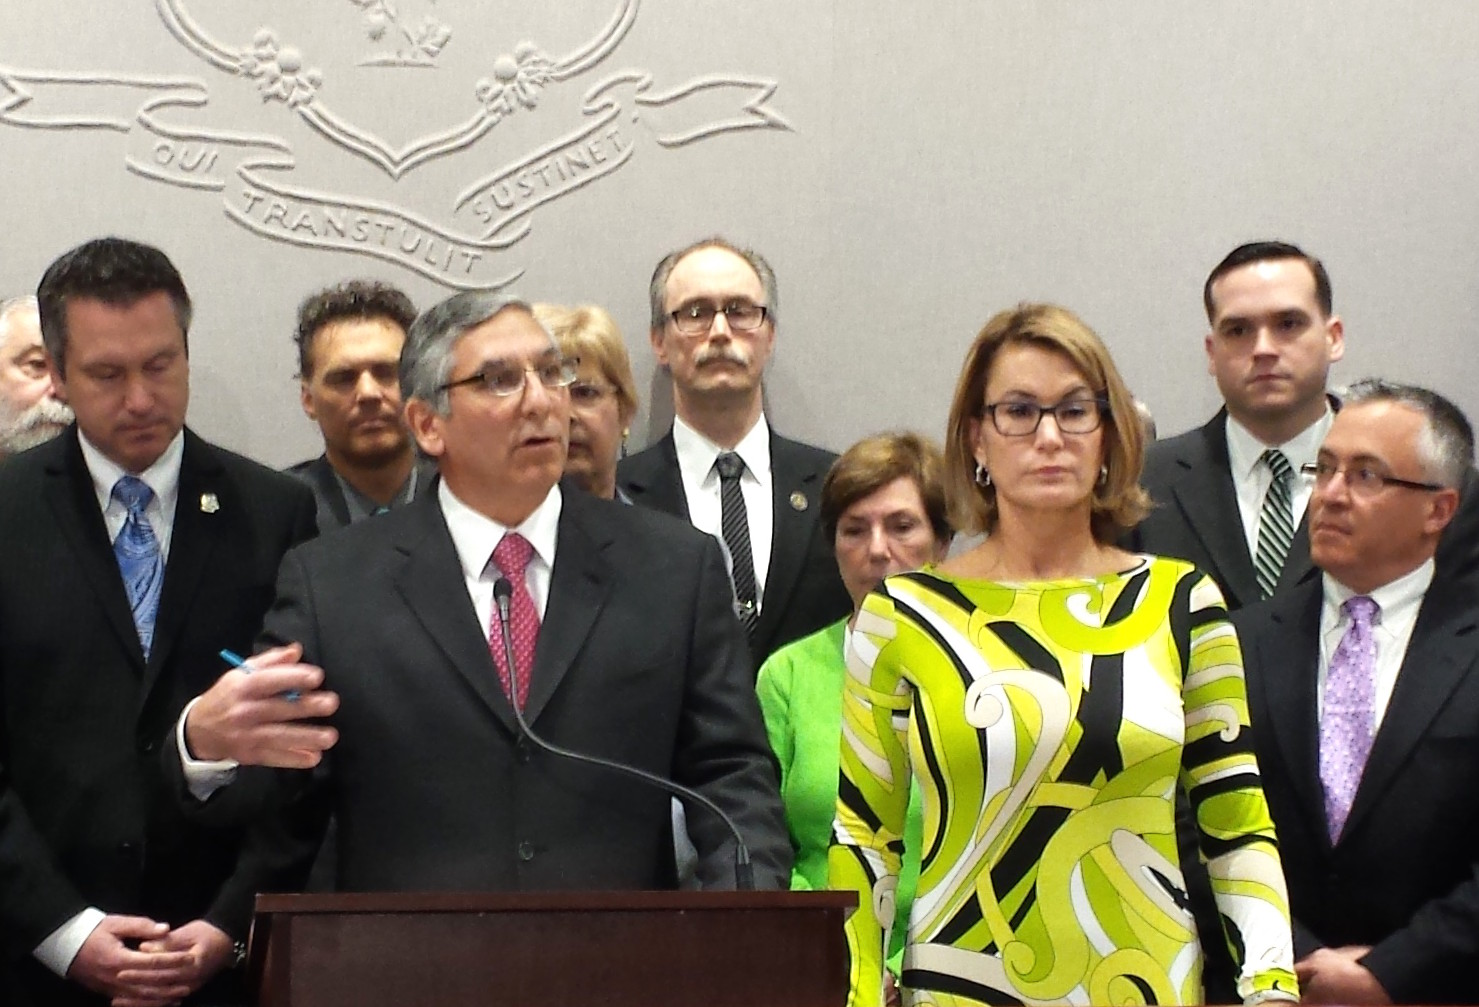 GOP: Seek big labor savings to reduce Malloy's painful cuts